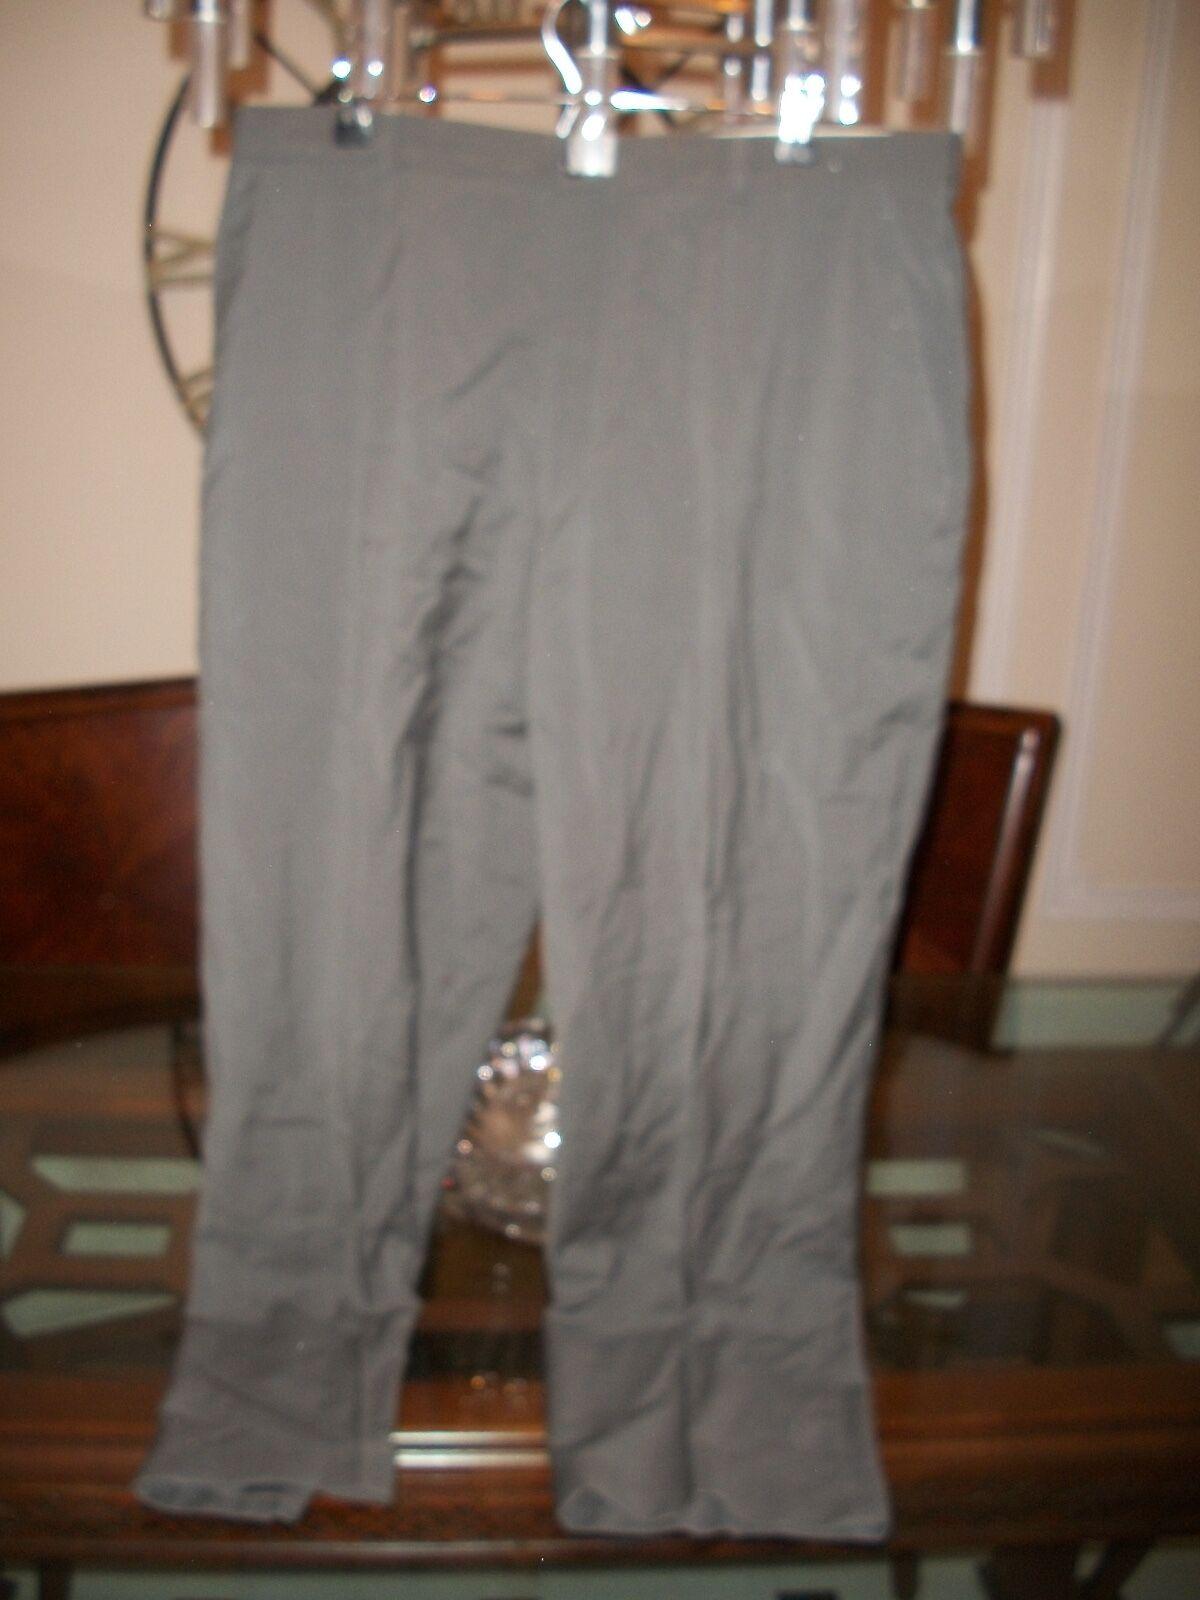 Used ARMANI COLLEZIONI olive flat front dress pants 36 x 33